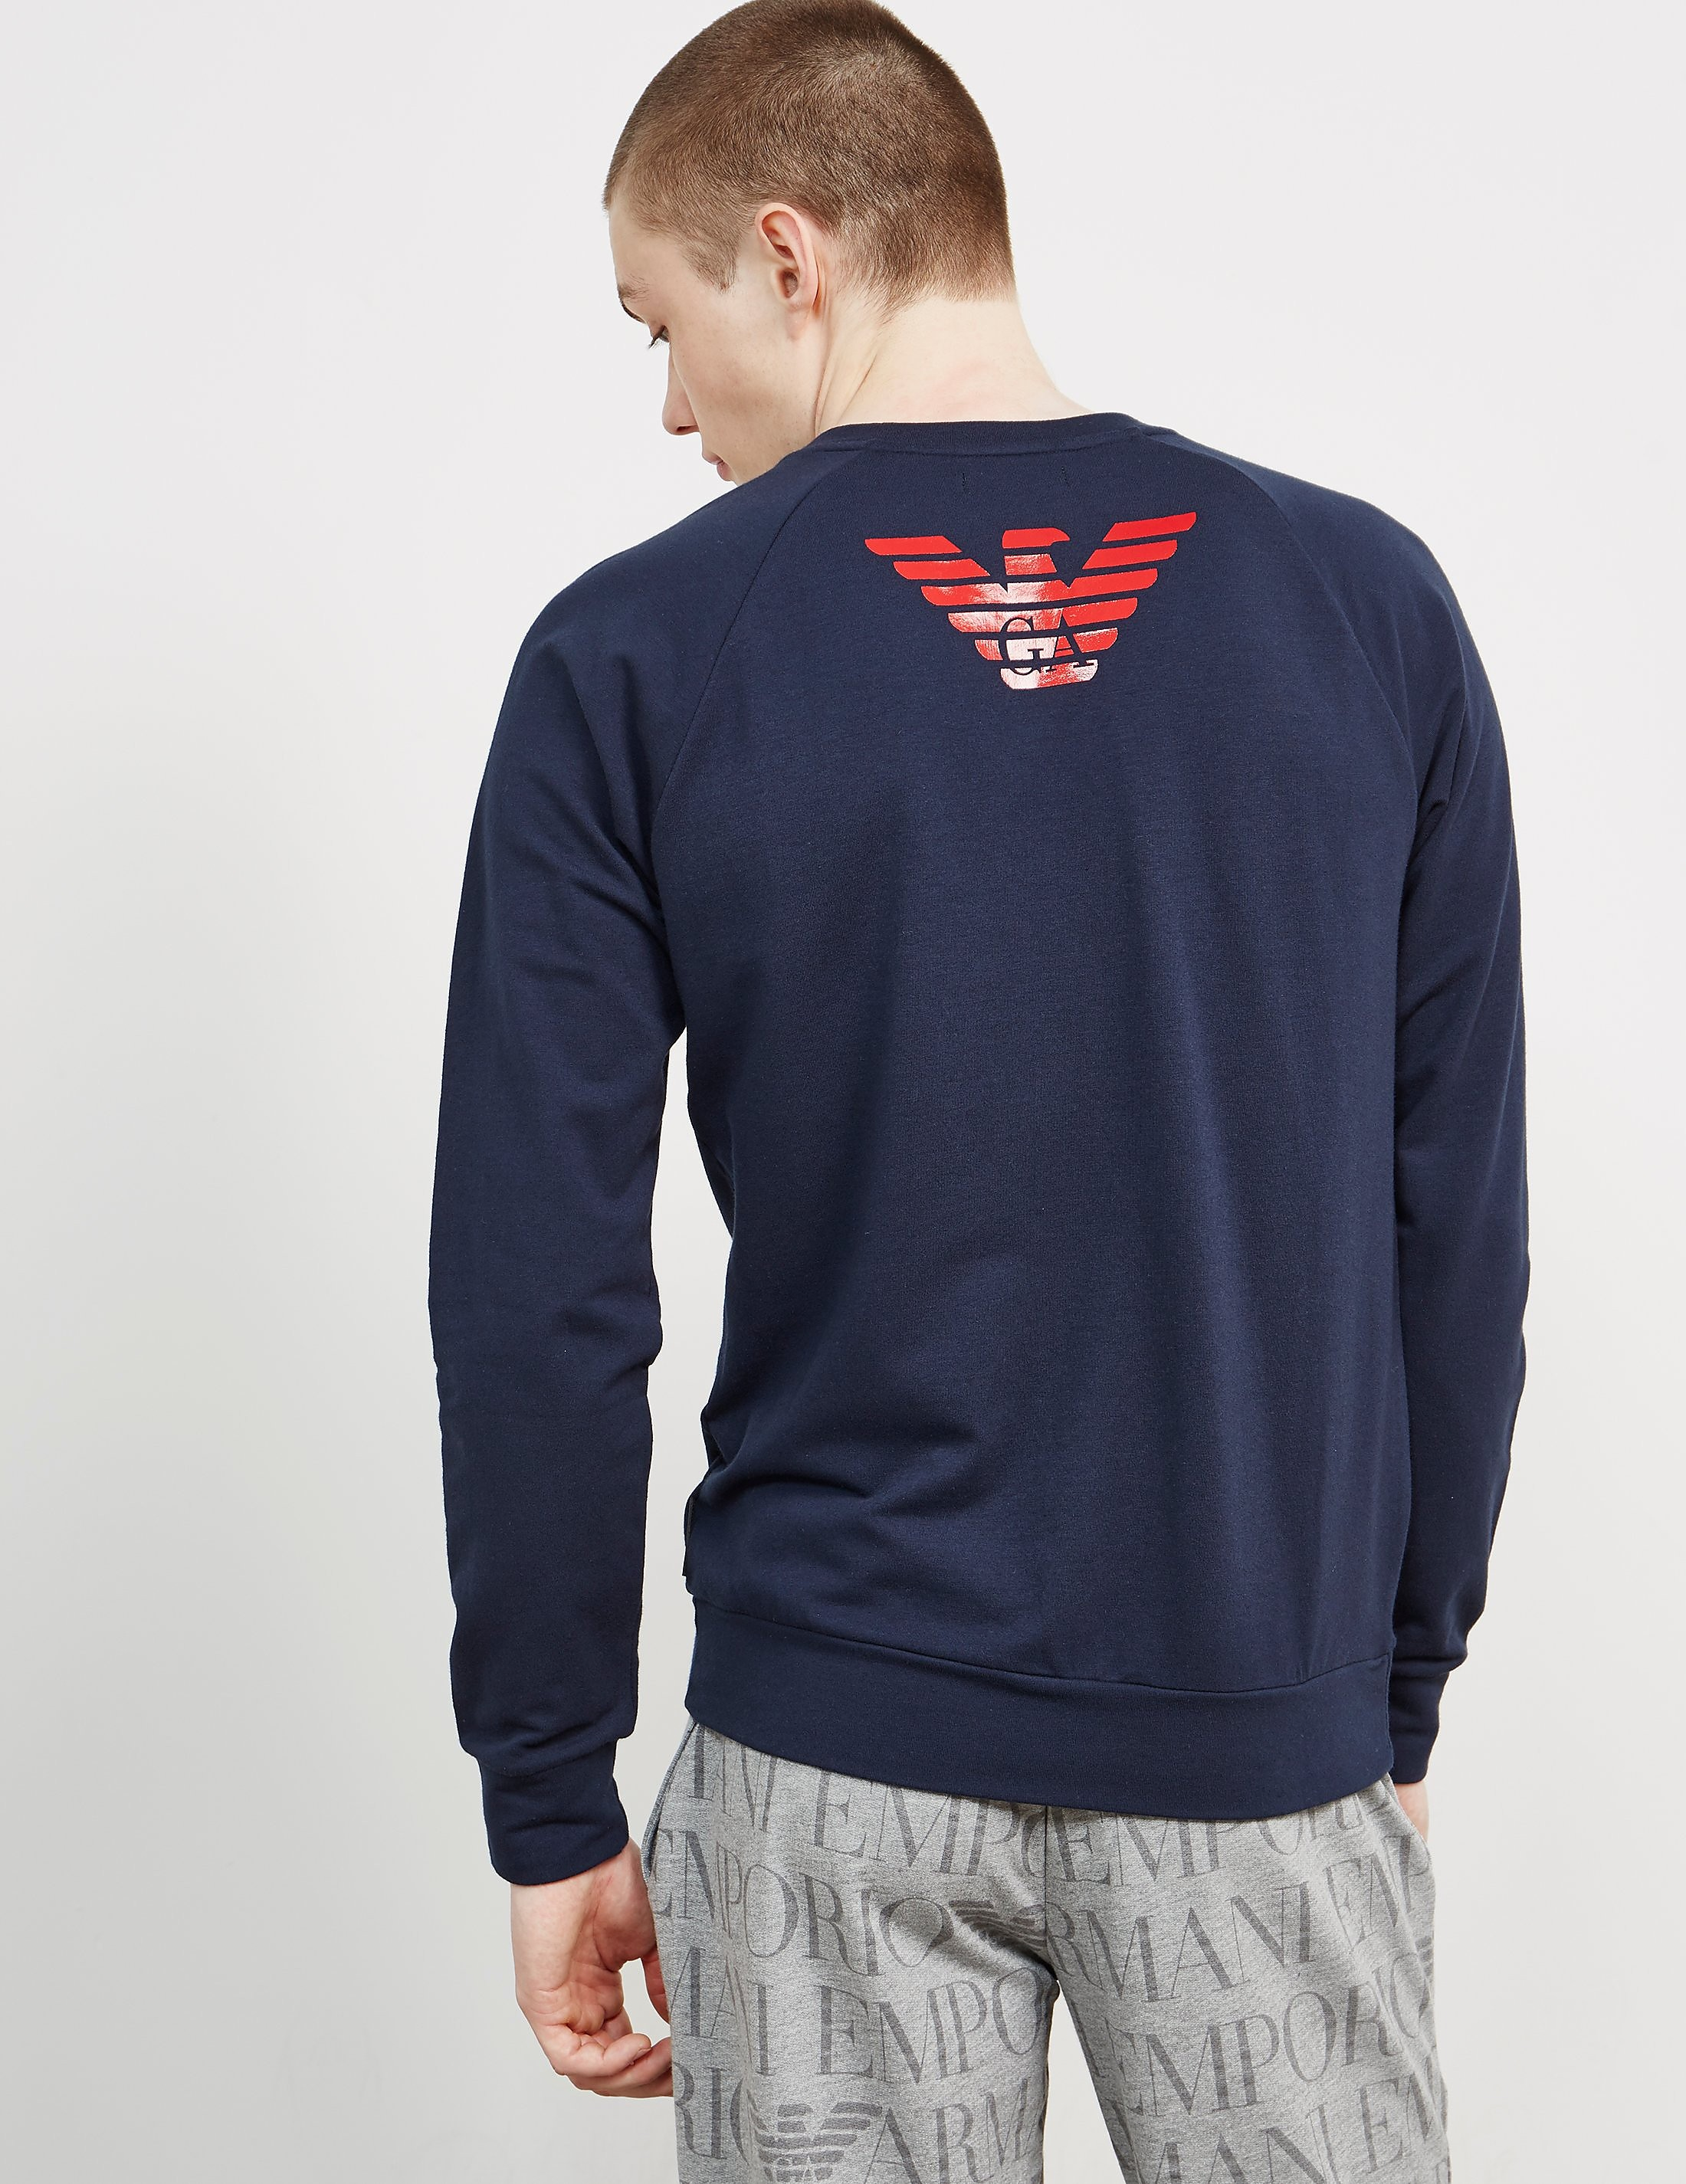 Emporio Armani Shiny Back Eagle Sweatshirt